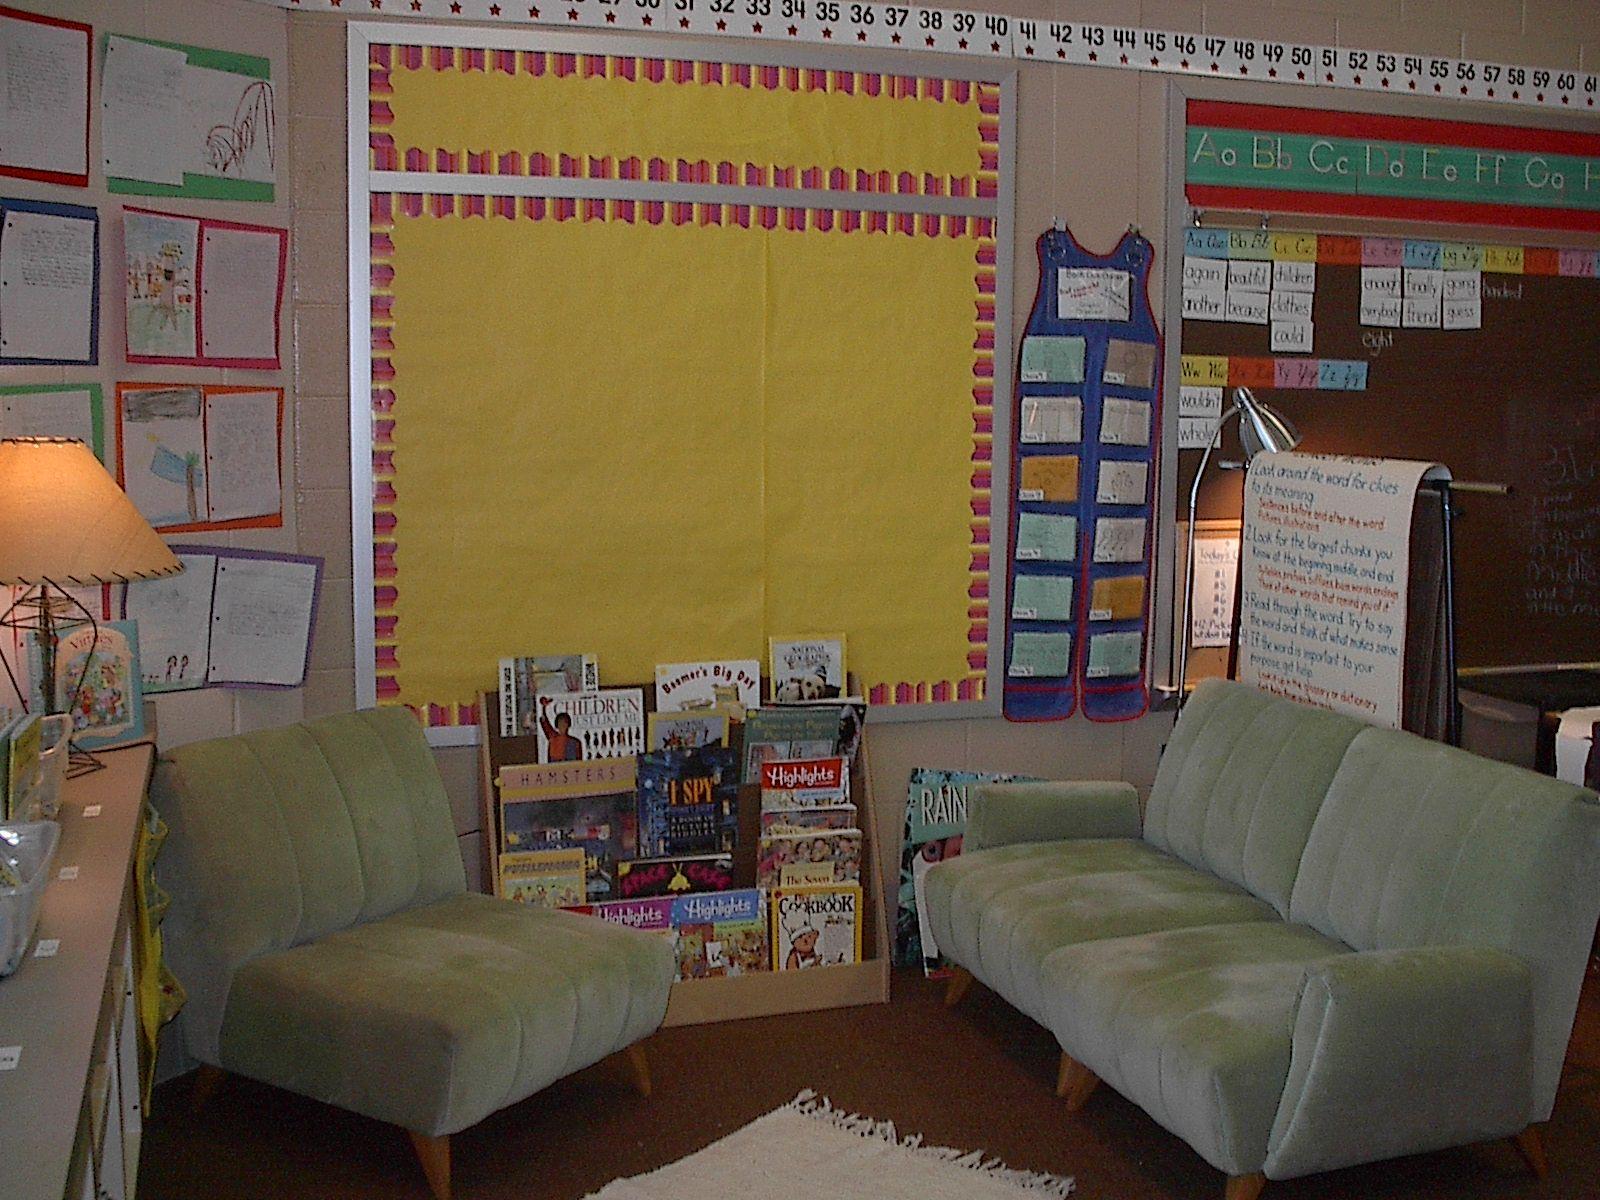 6th Grade Classroom Design Ideas ~ Th grade classroom setup ideas room the school